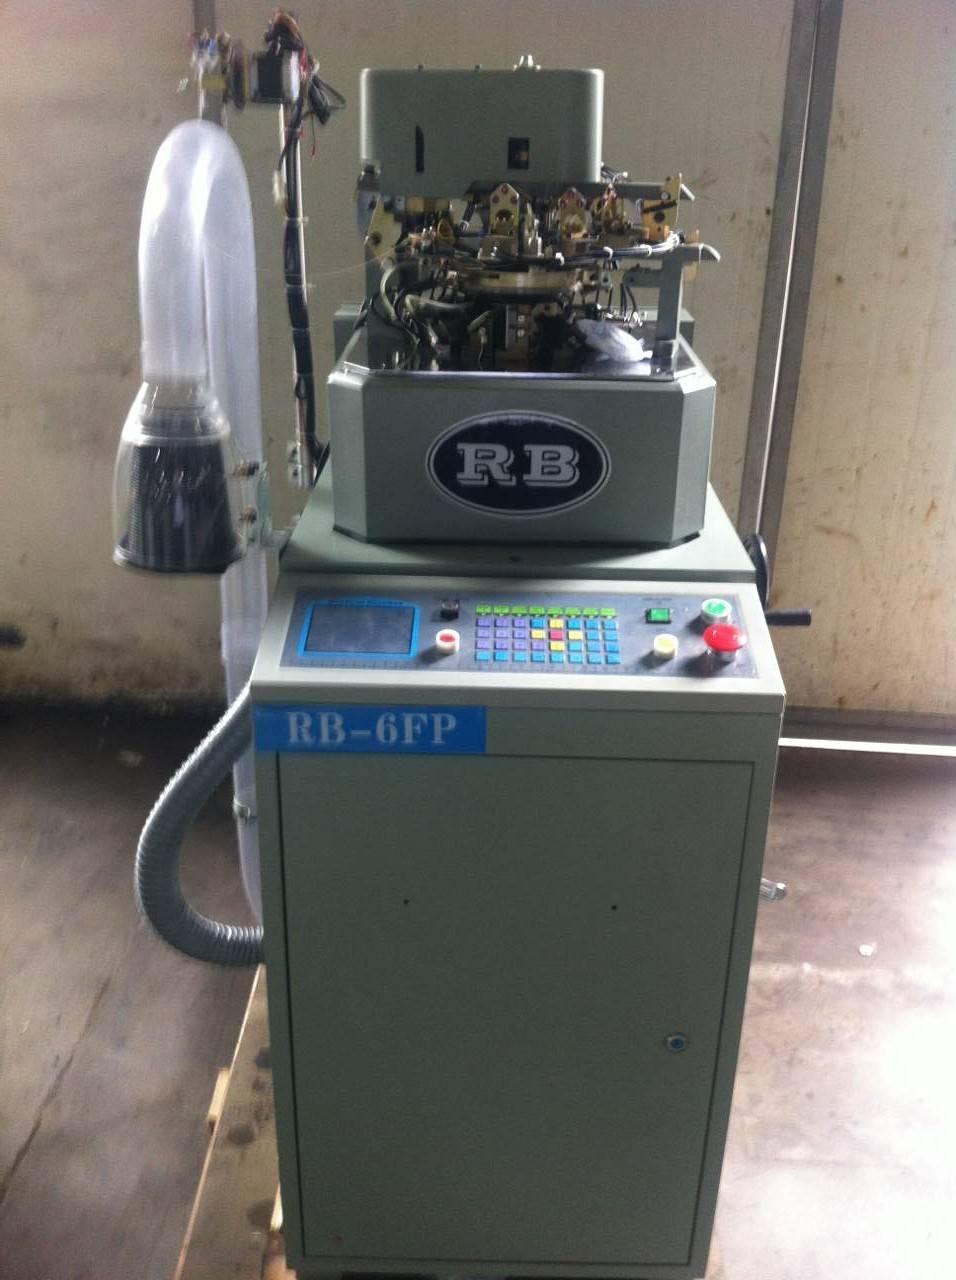 RB-6FP Professional High Speed Plain Sock Making Machine 3.5 Inch